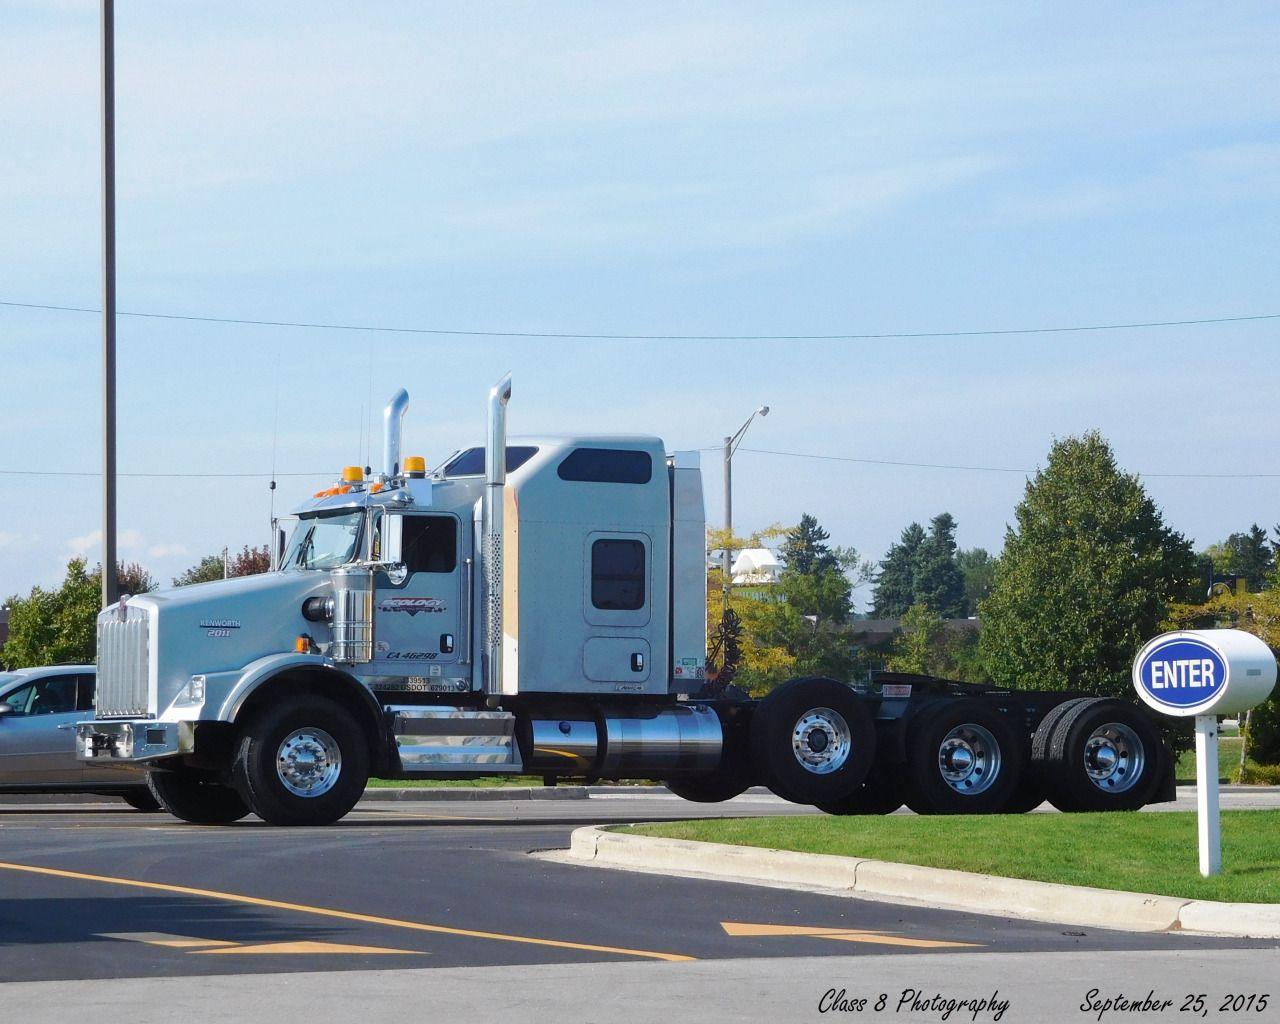 Kenworth T800 Personalizado Heavy Haul With Images Trucks Big